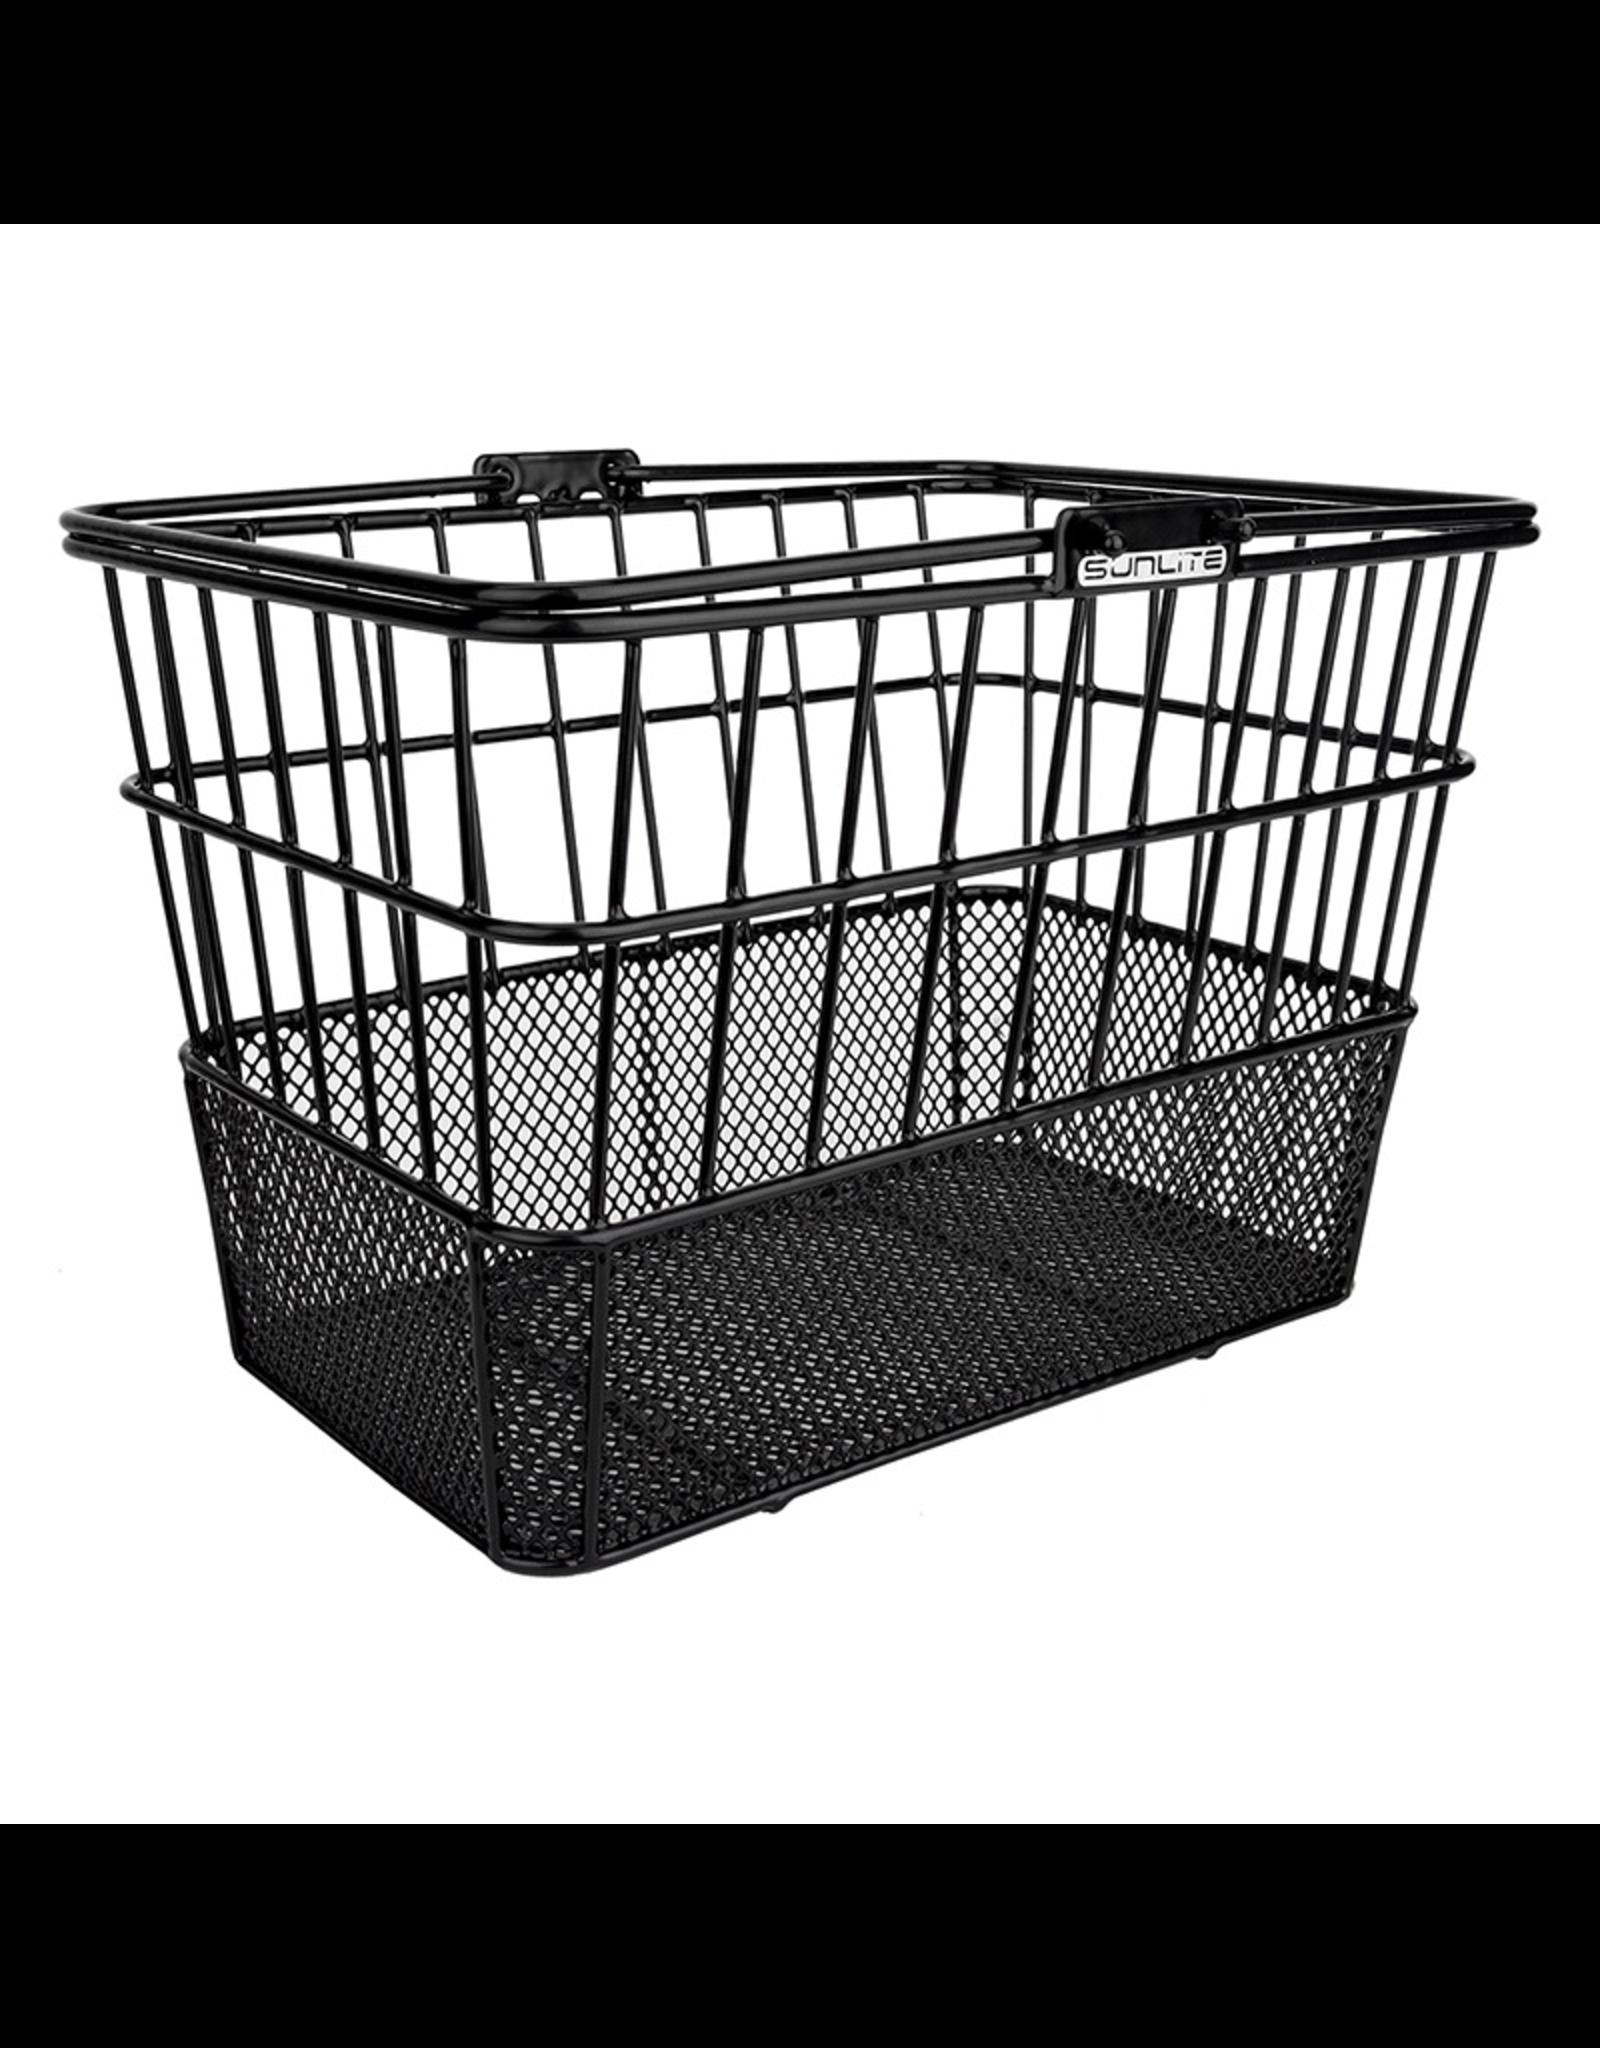 Sunlite Sunlite/Ultracycle Front Basket - Mesh Bottom Lift-Off, Black